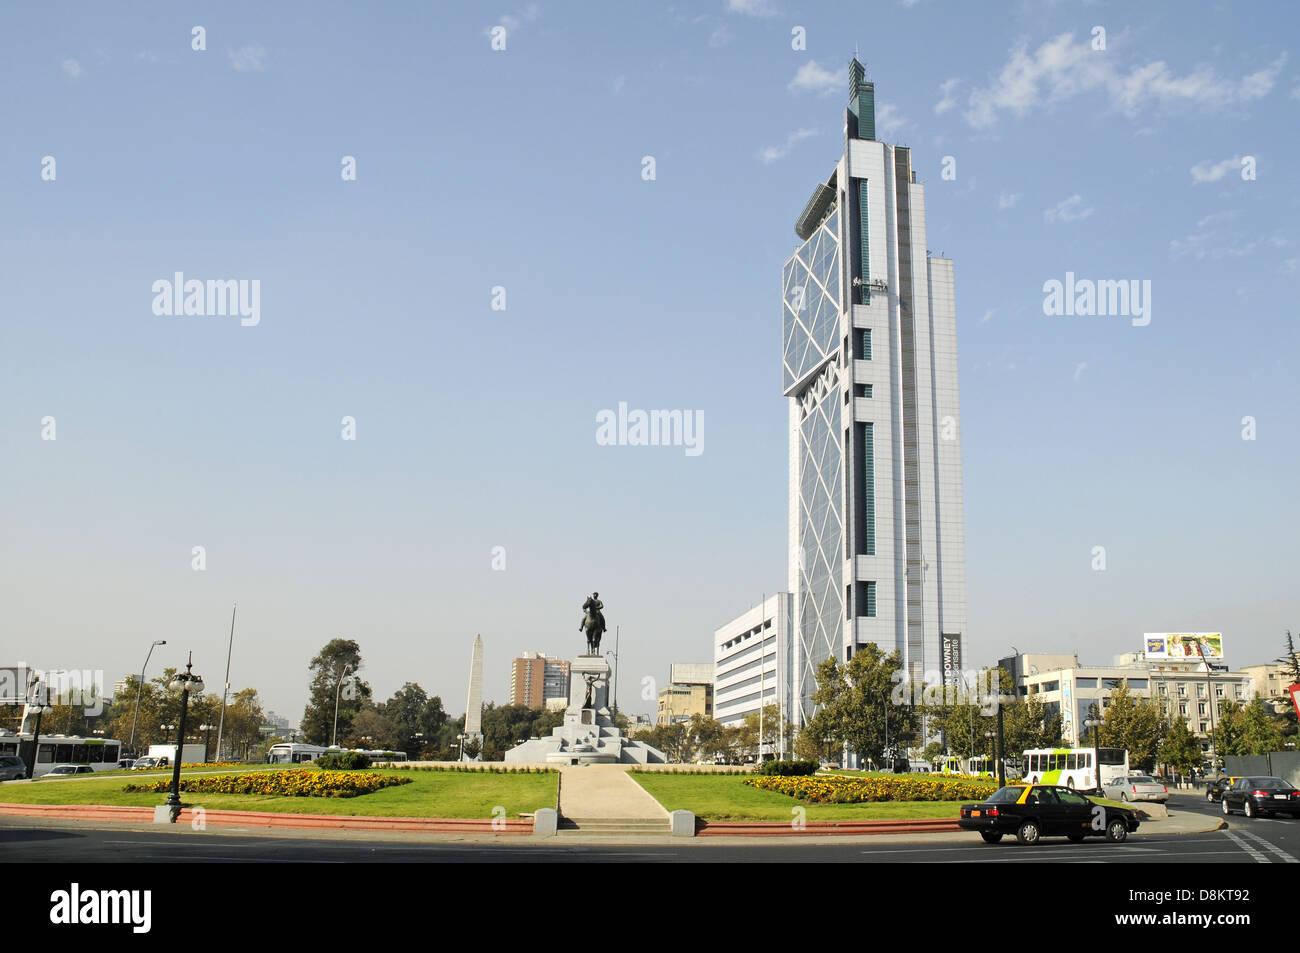 Plaza Baquedano - Stock Image